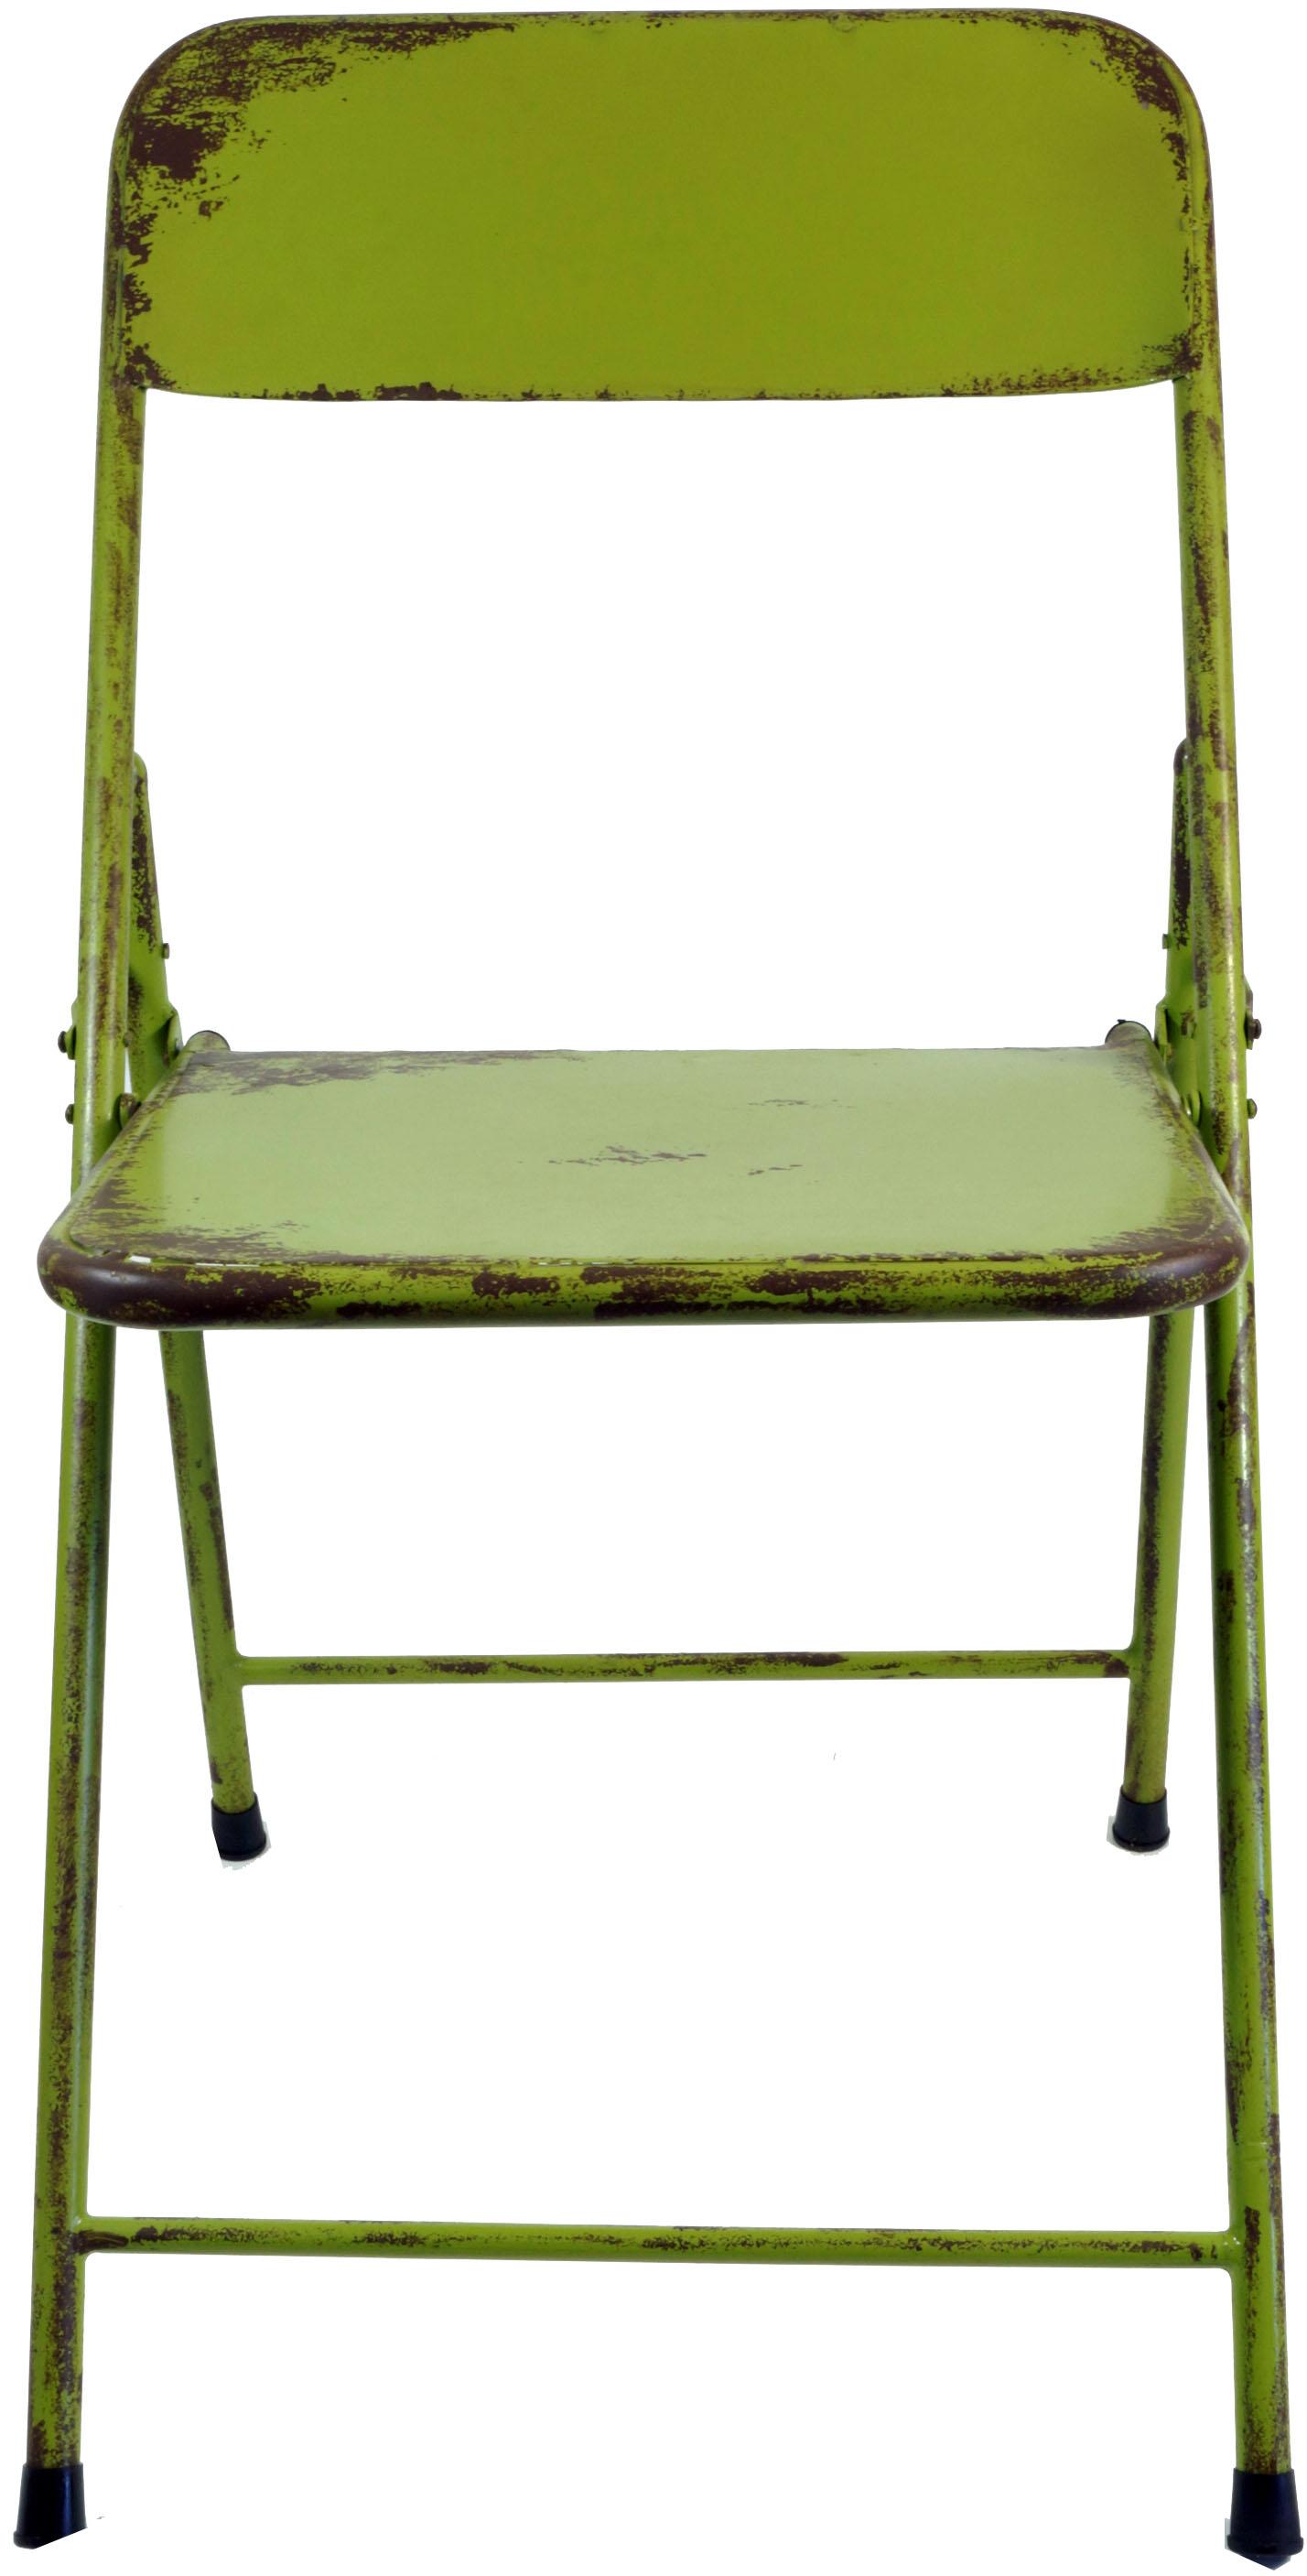 klappstuhl aus metallrohr im industrial vintage design. Black Bedroom Furniture Sets. Home Design Ideas